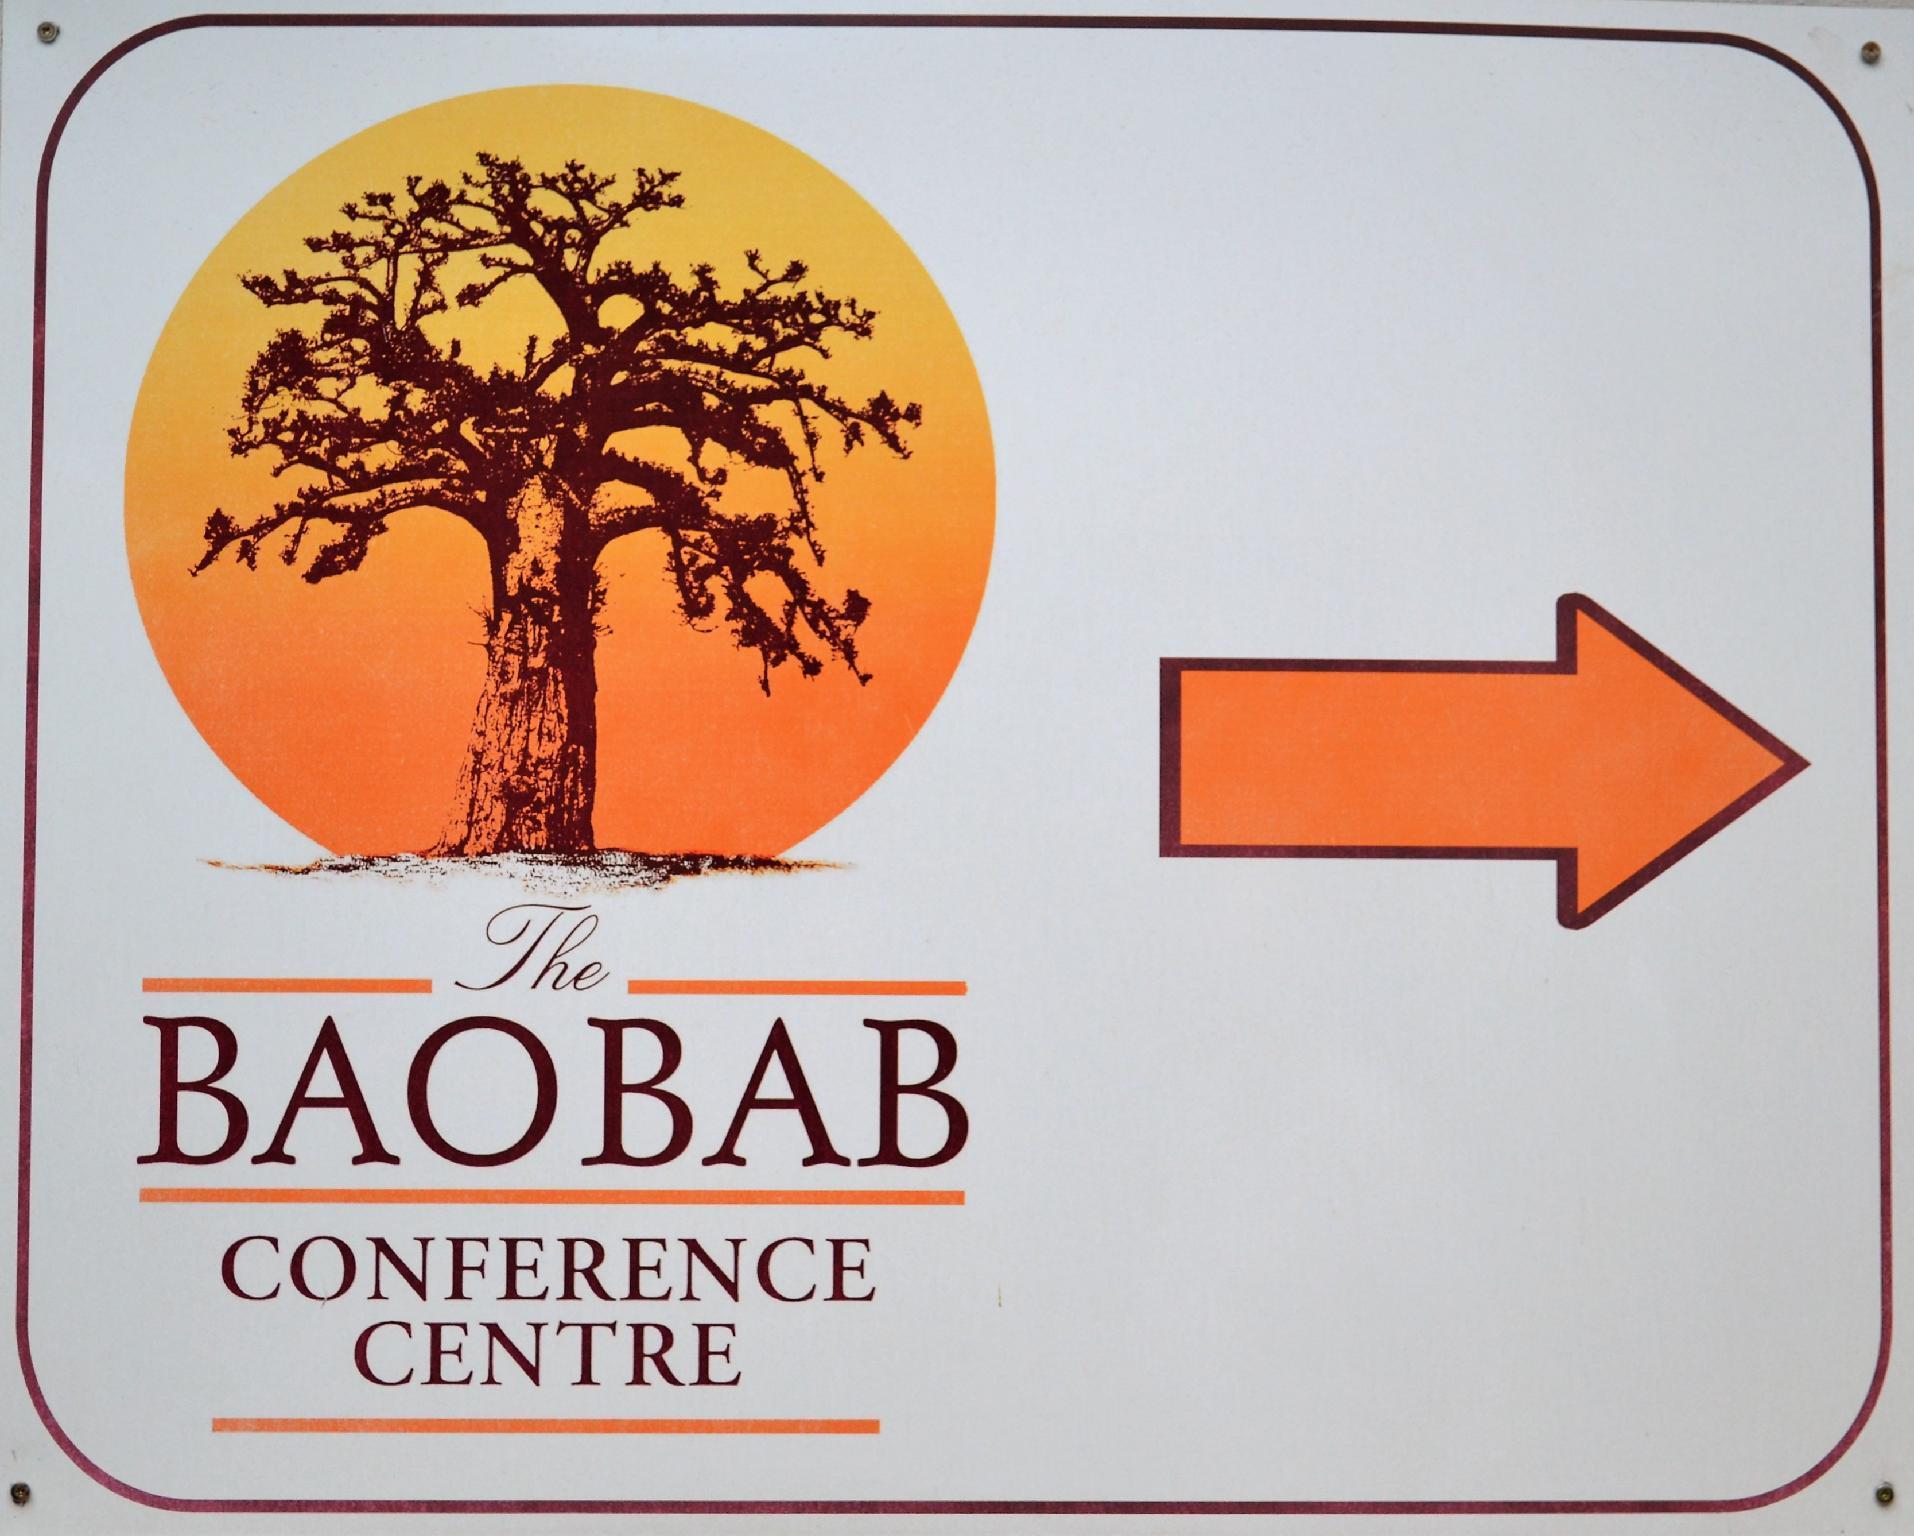 The Baobab BnB